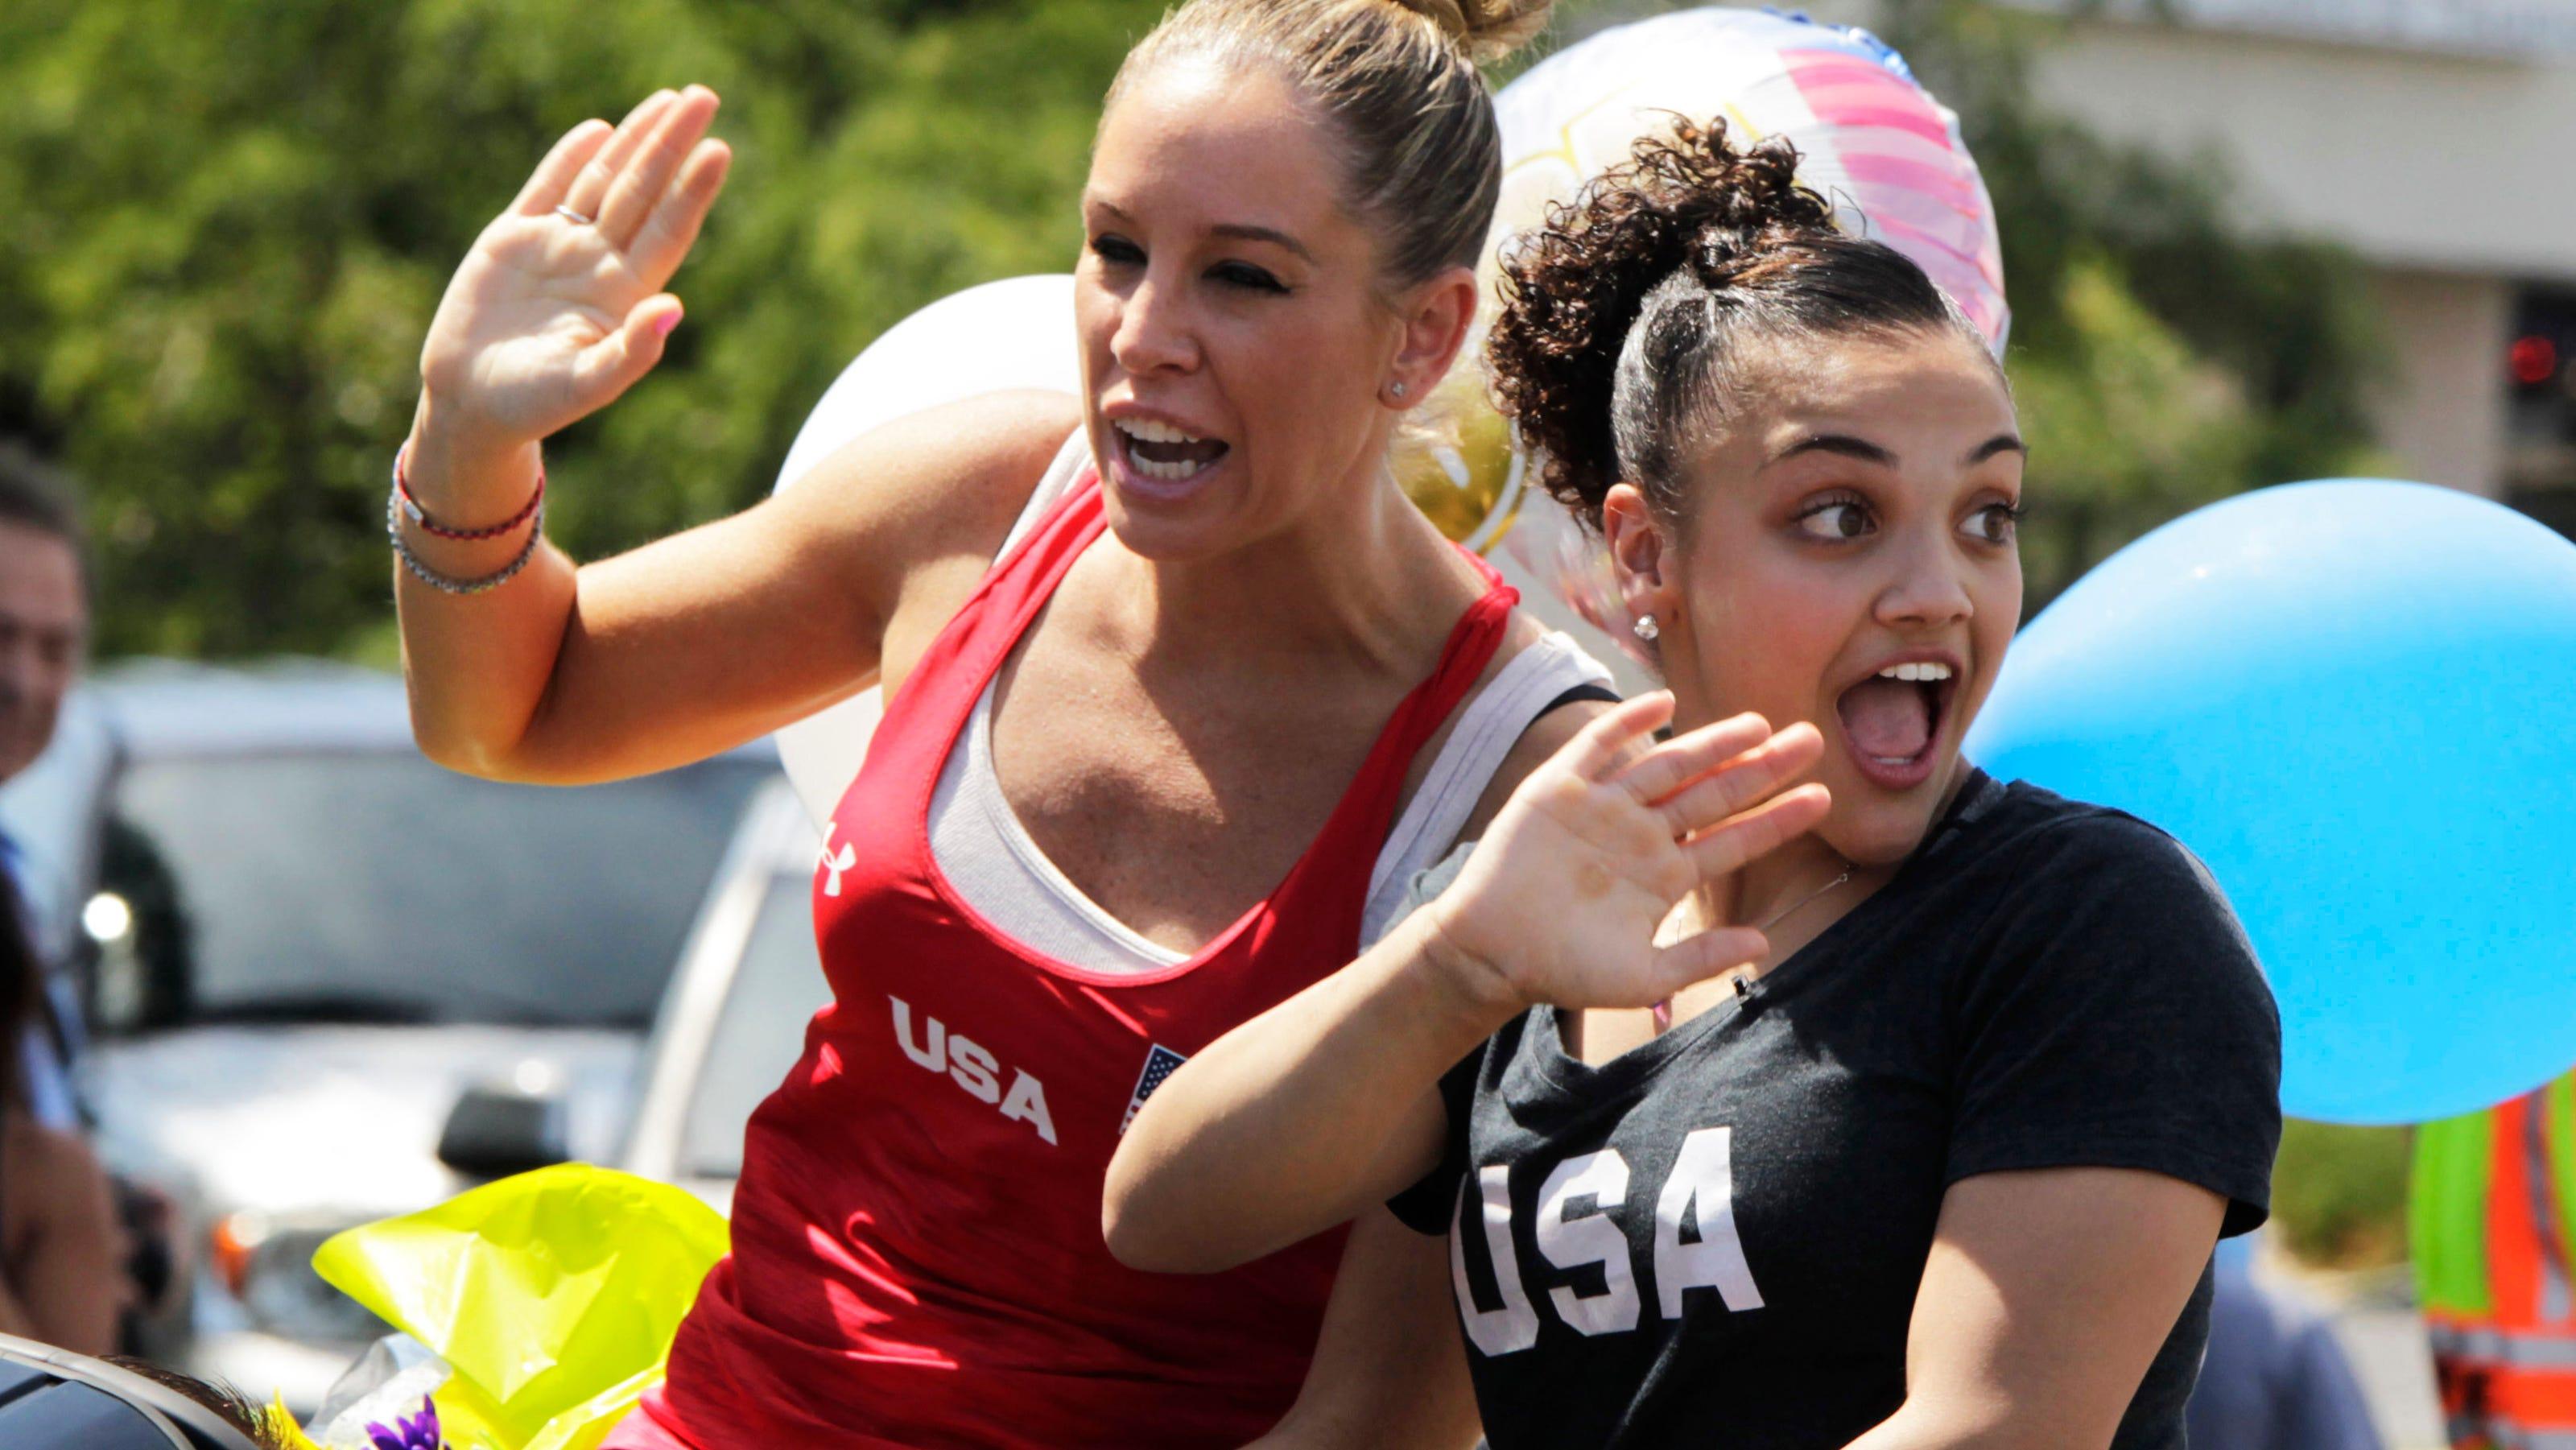 Helen Maroulis world championships streak ends after life